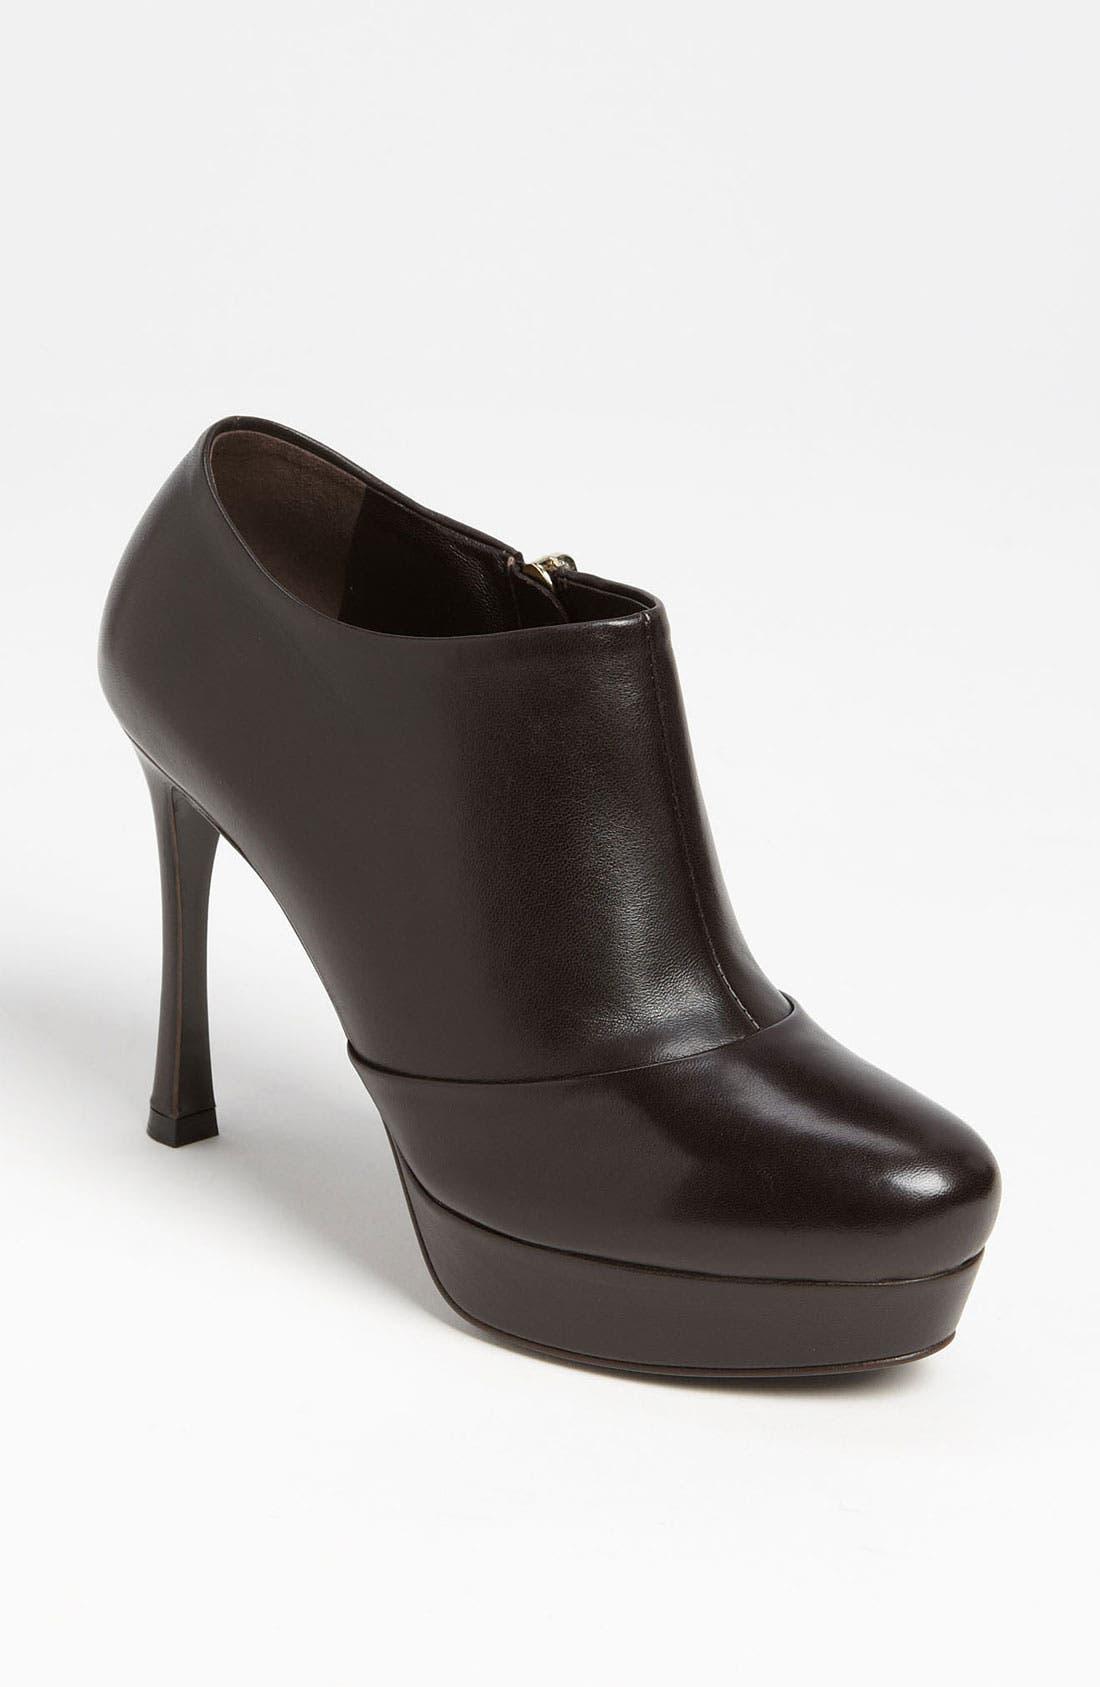 Main Image - Yves Saint Laurent Ankle Bootie